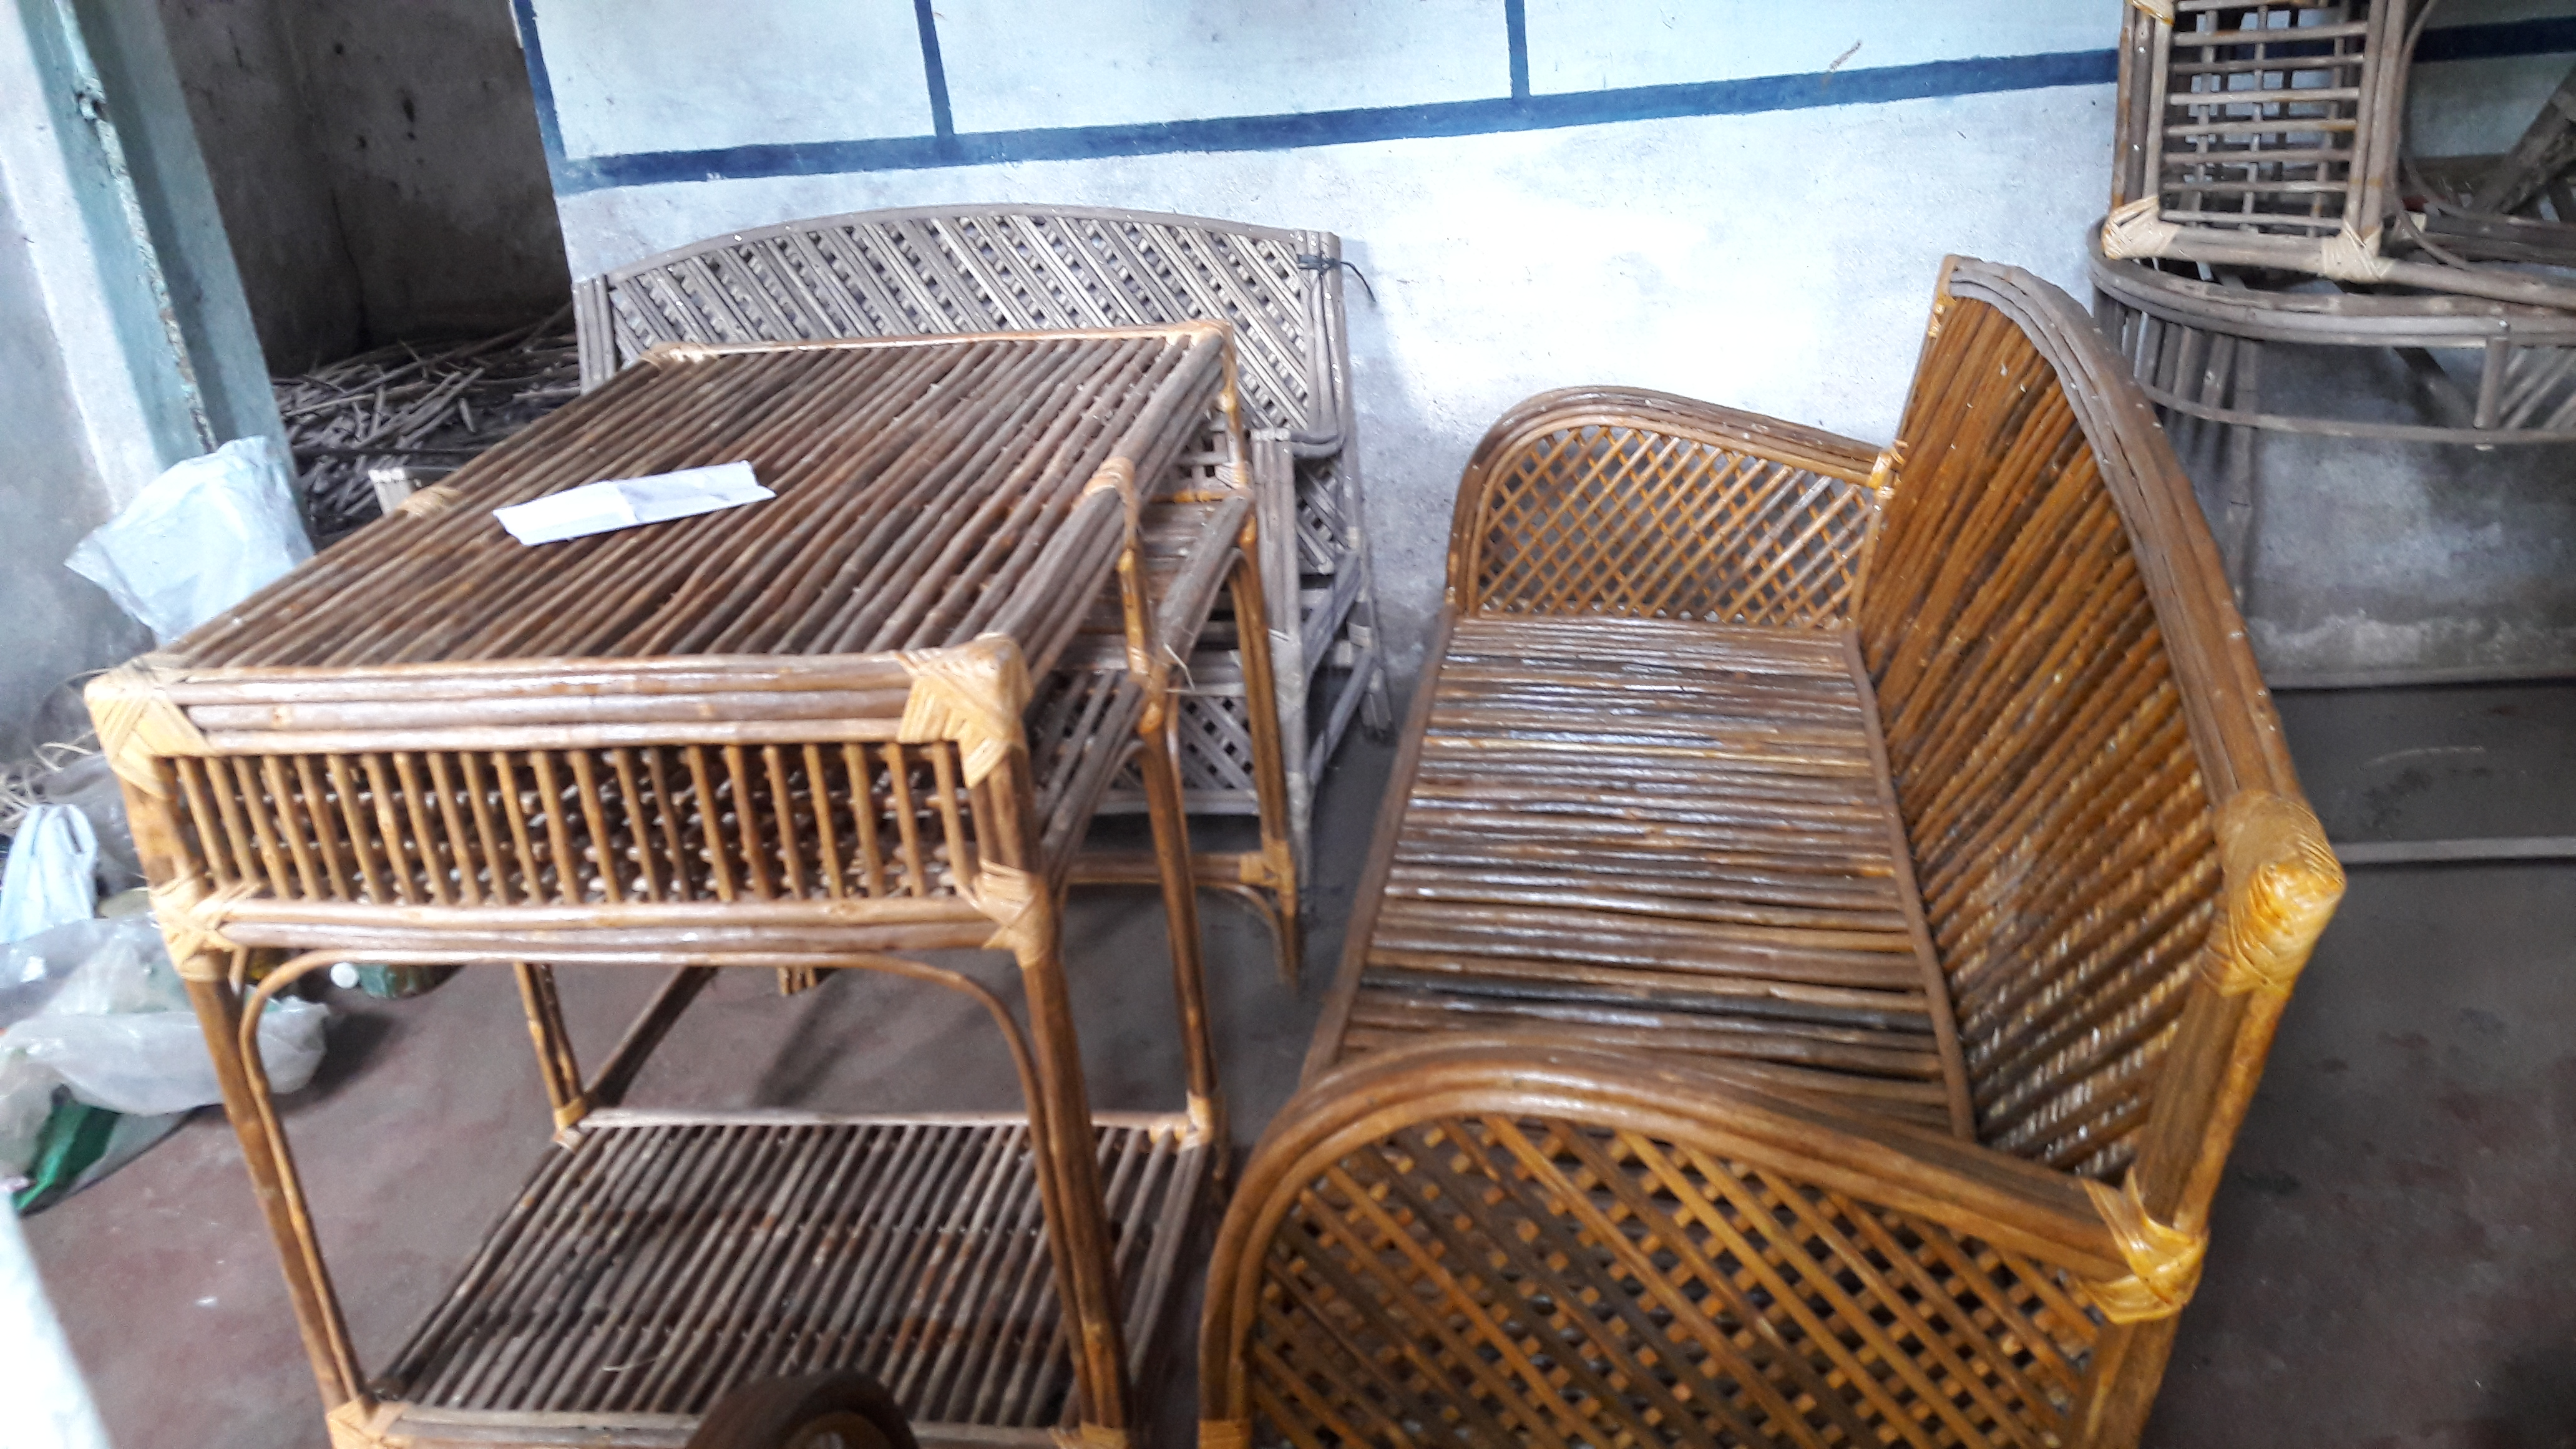 Wicker Furniture Craftsmanship